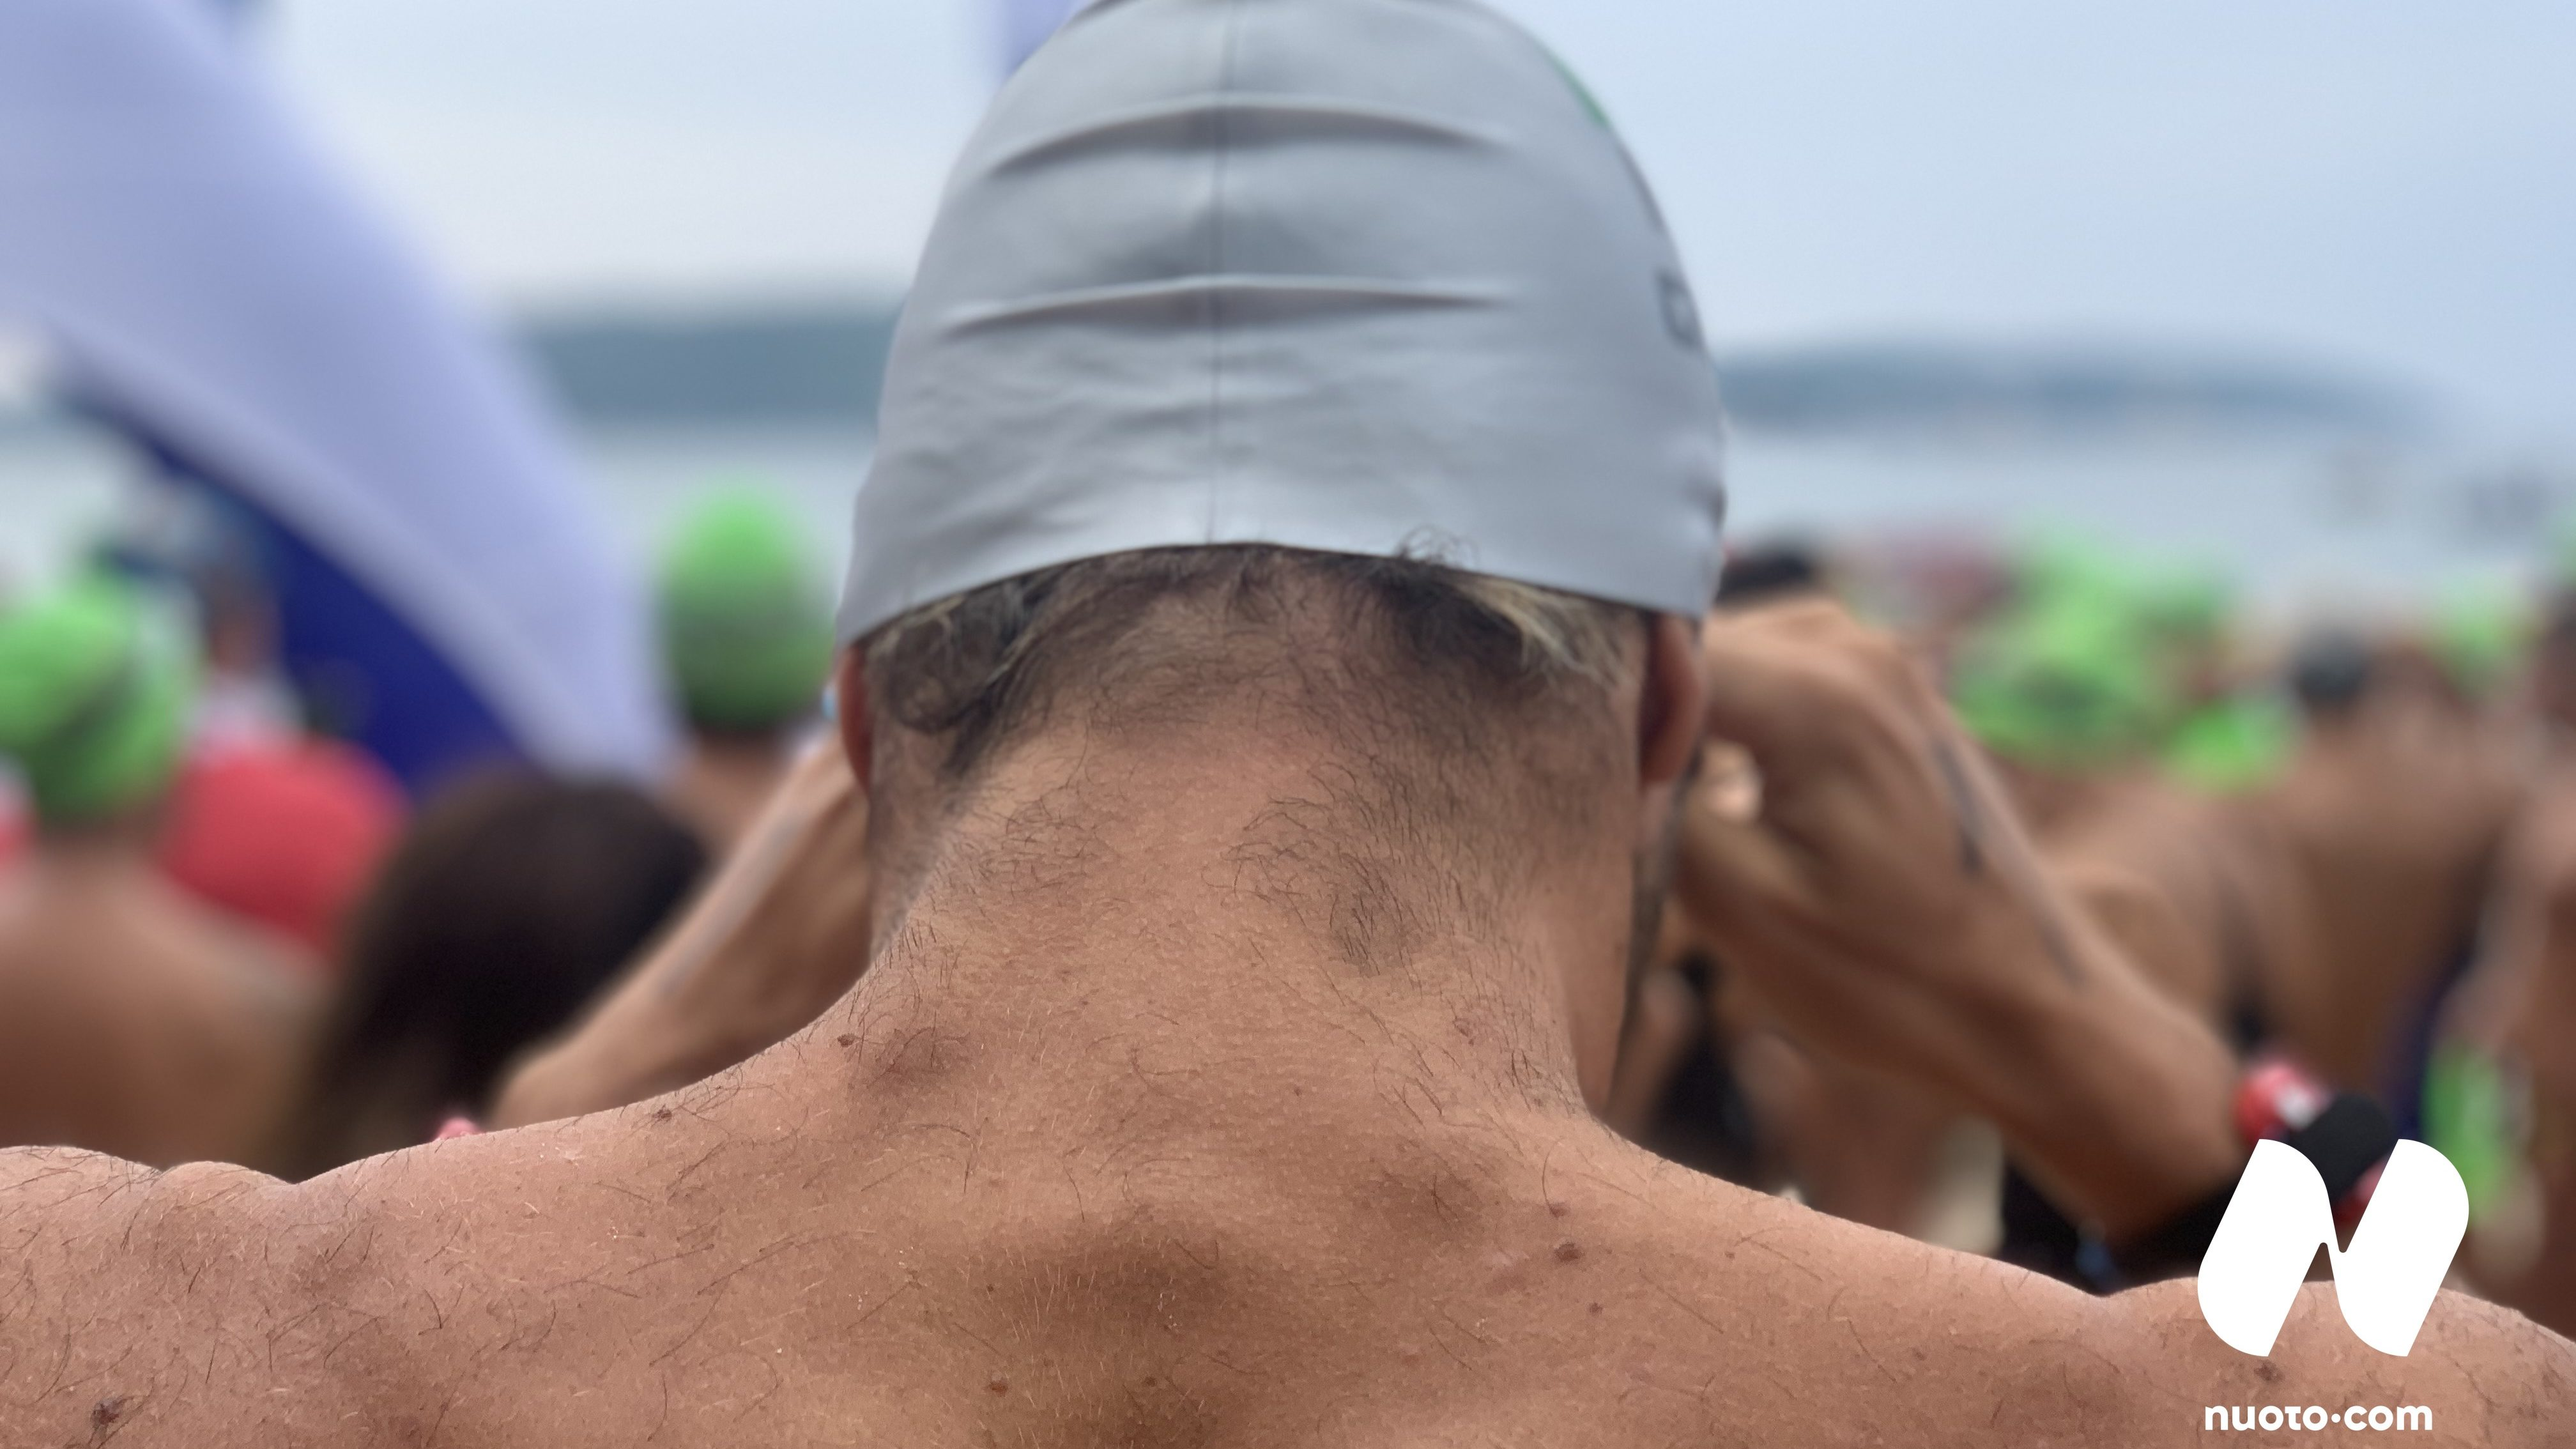 Freedom in water, Paltrinieri protagonista